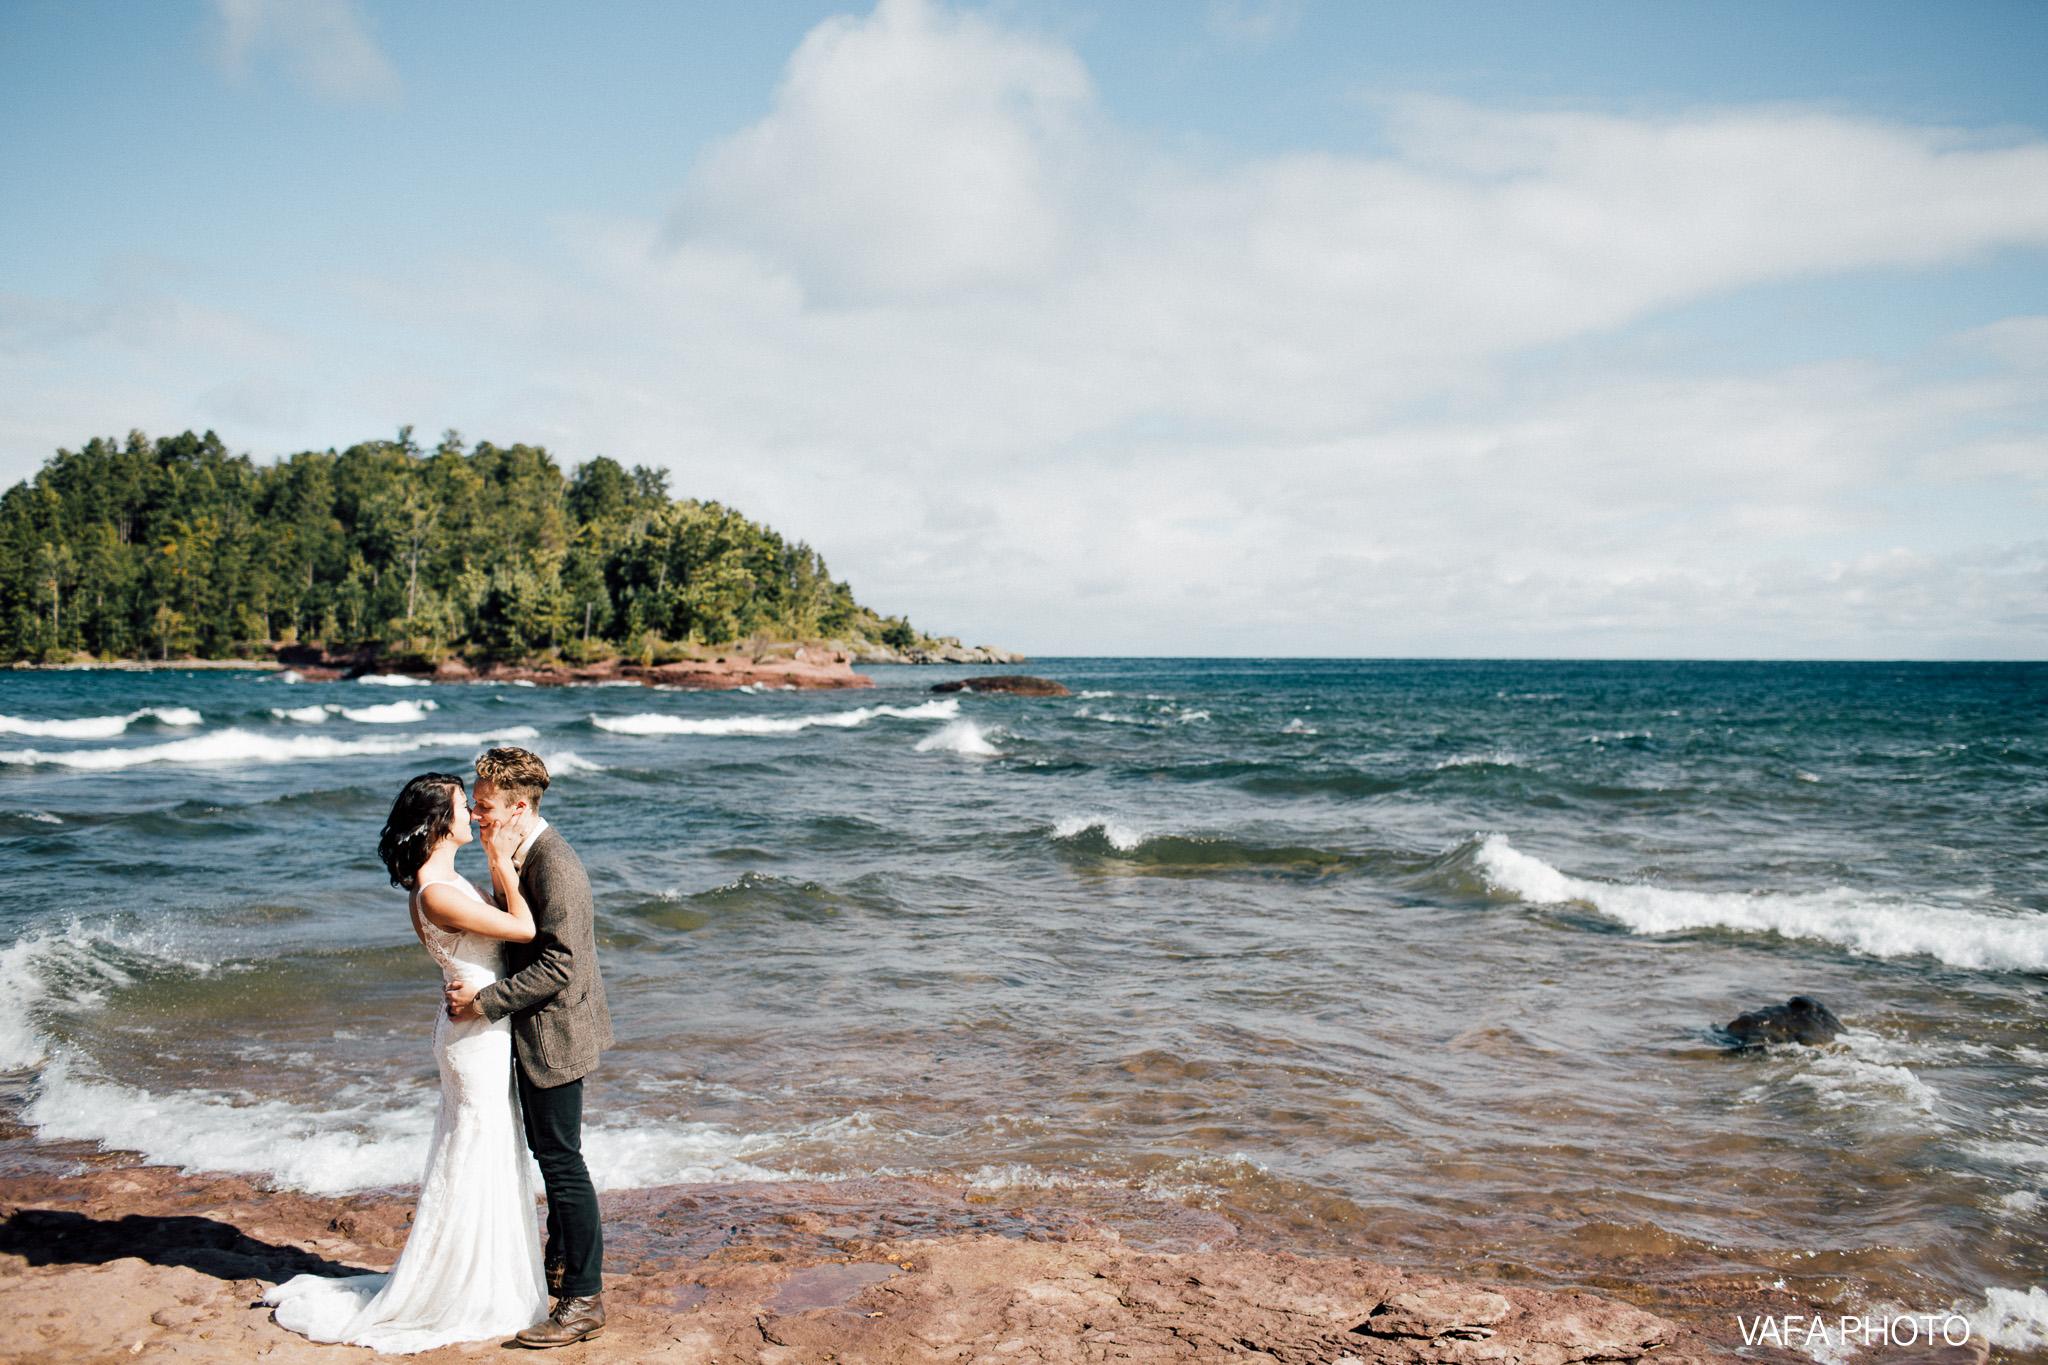 Hogback-Mountain-Wedding-Chelsea-Josh-Vafa-Photo-637.jpg